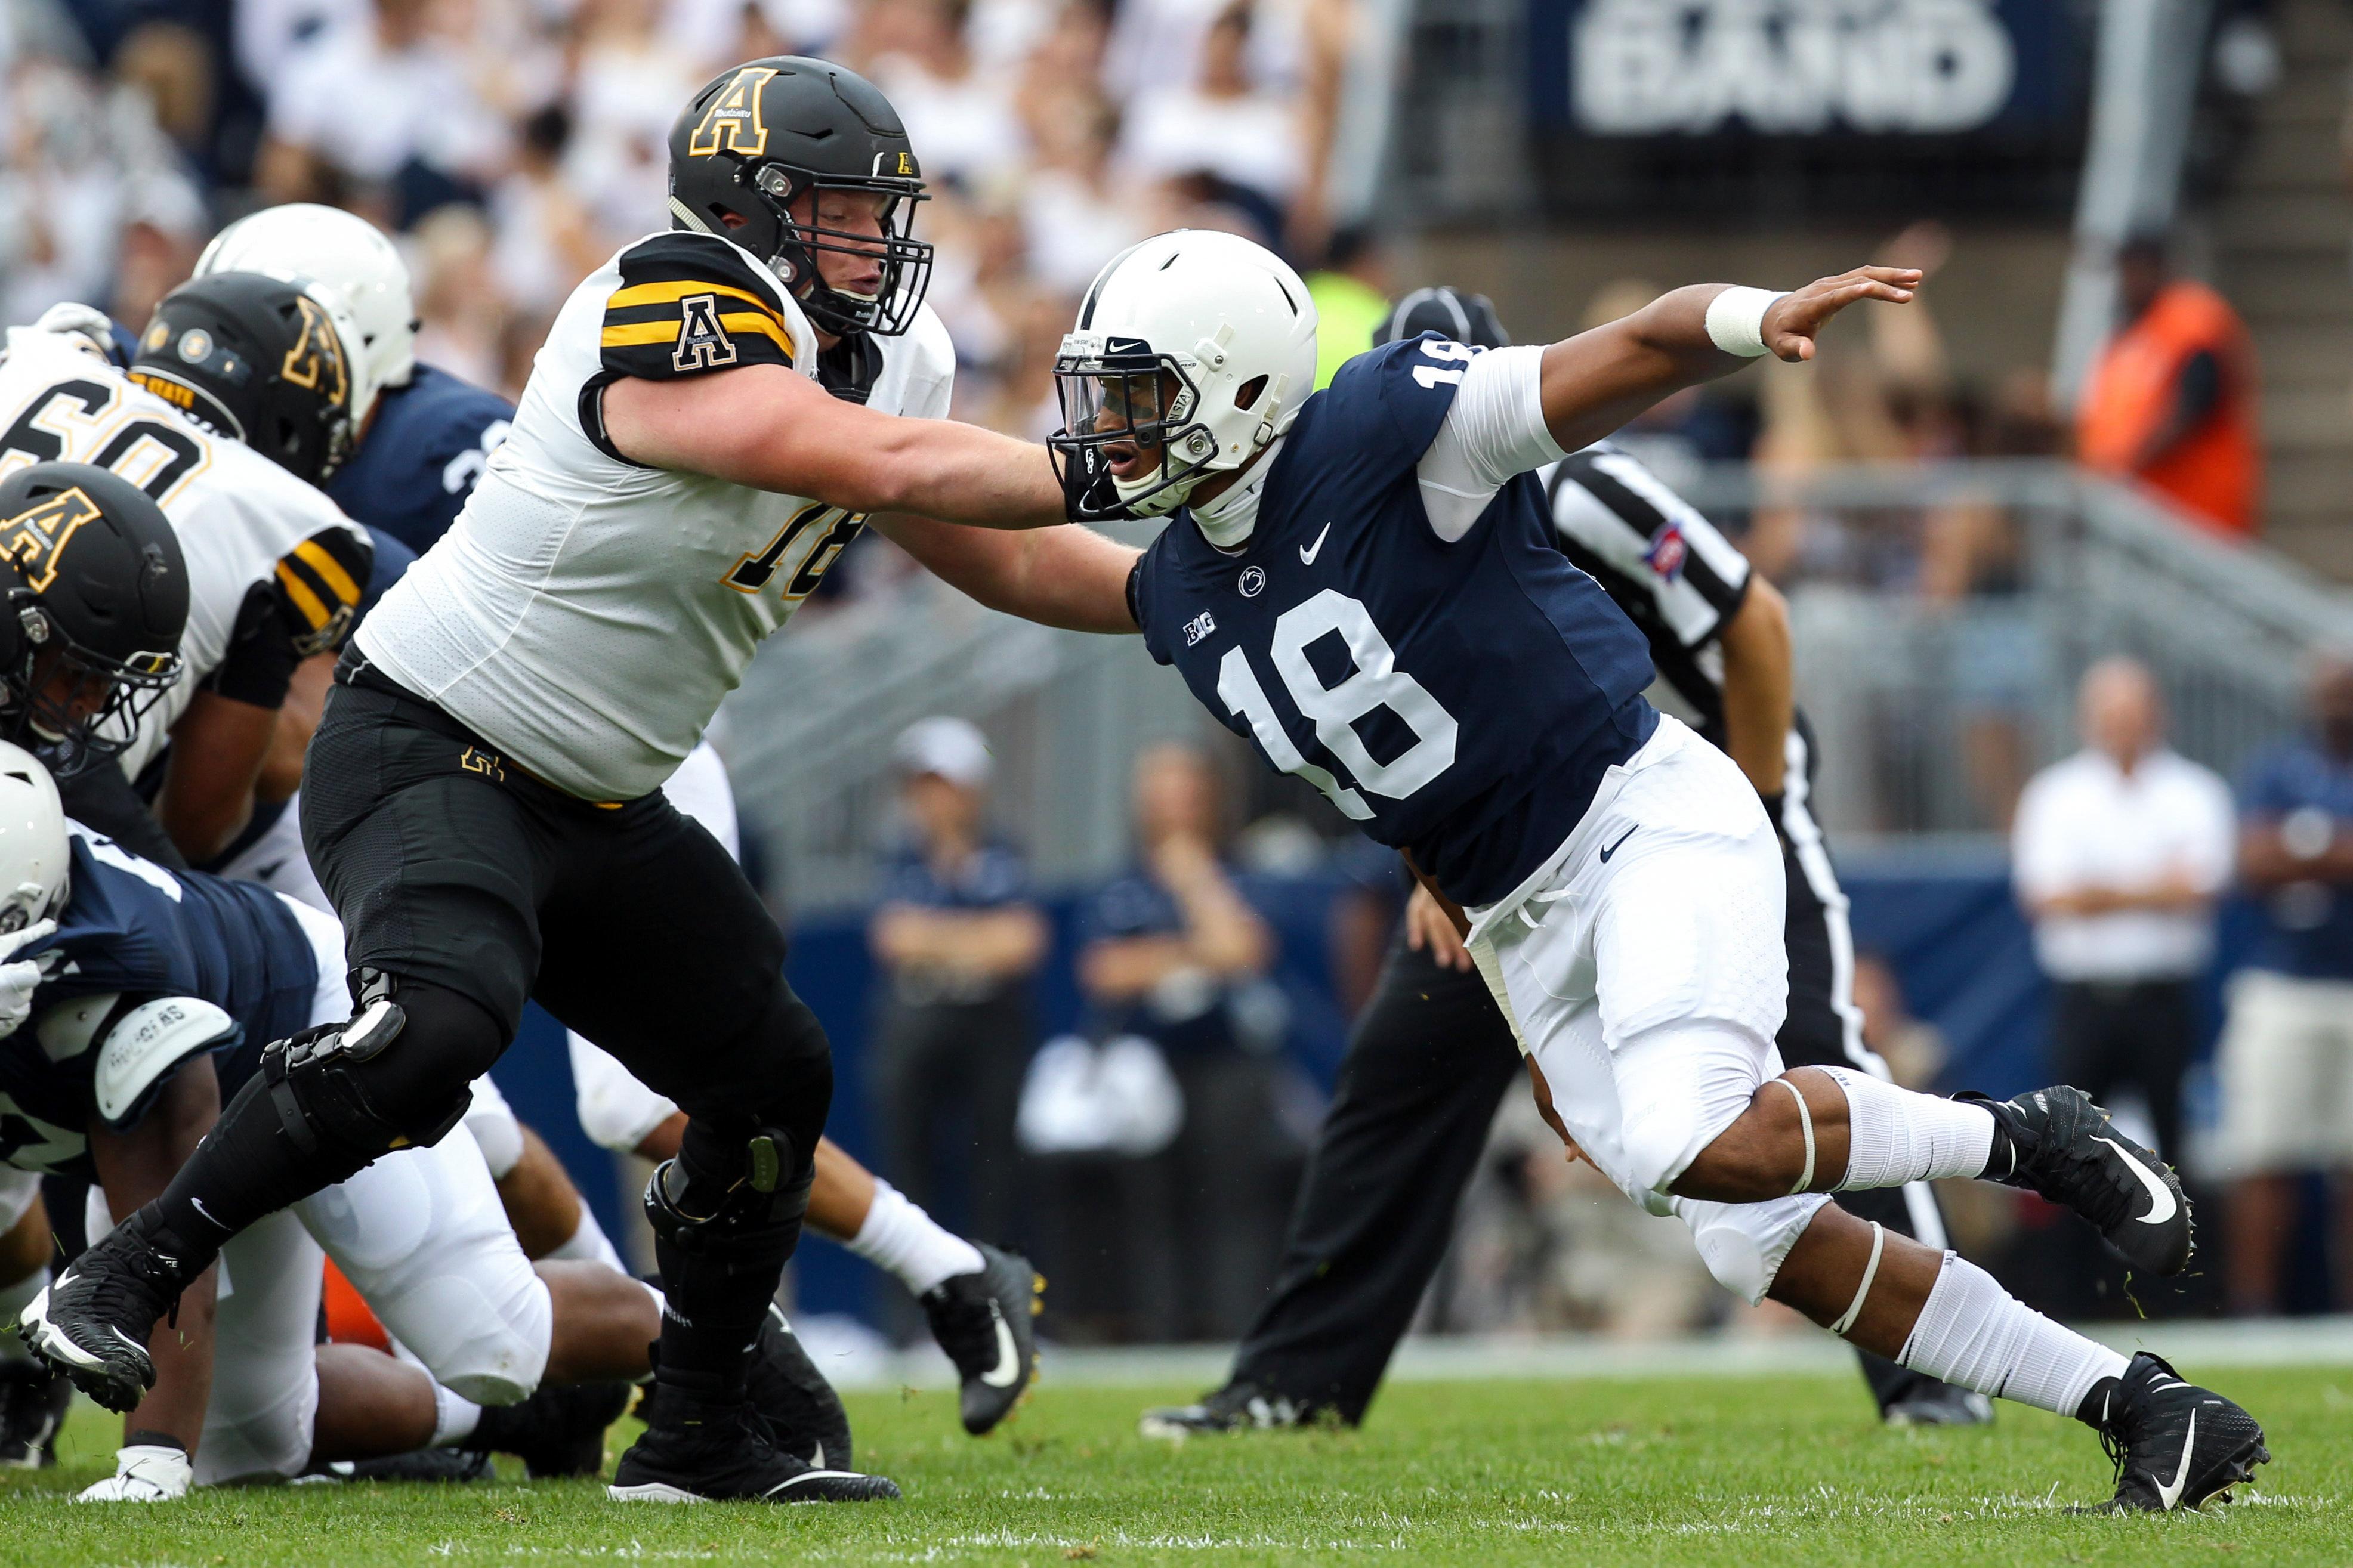 NCAA Football: Appalachian State at Penn State